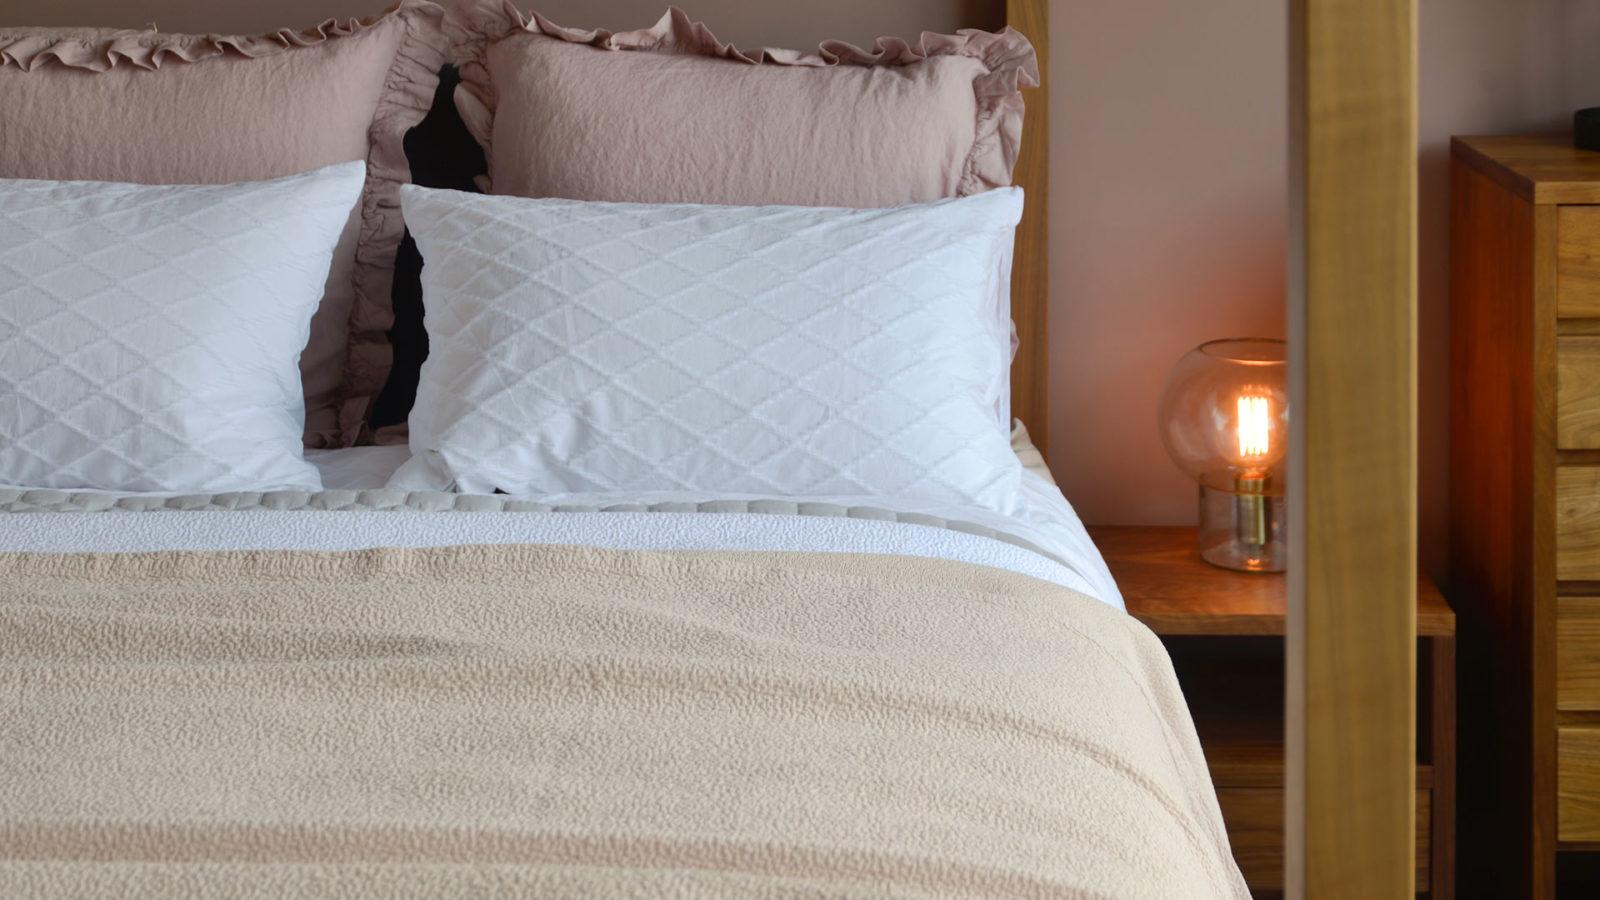 Dapple Bedspread Warm Shell - Cotton